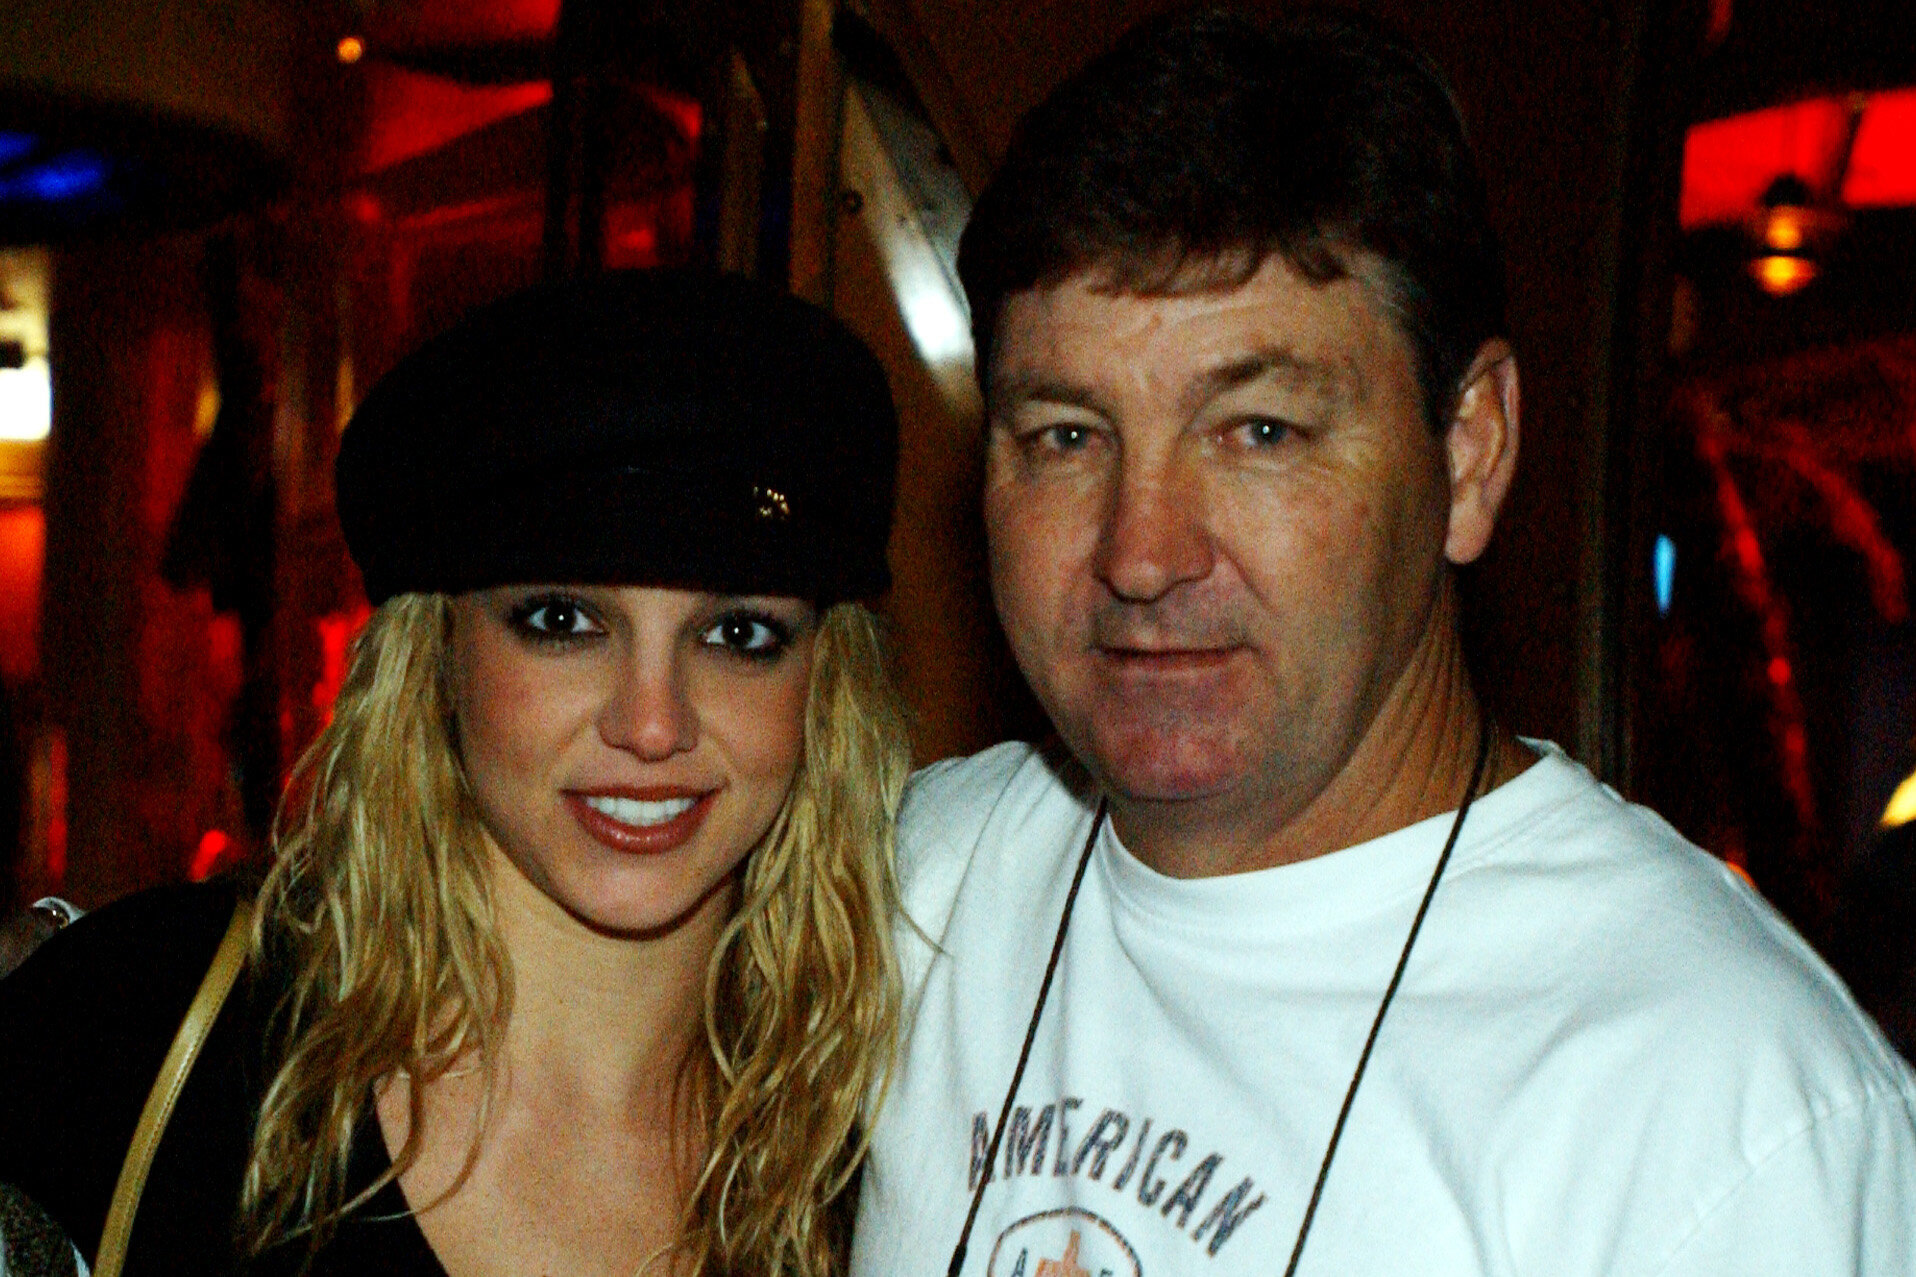 Britney Spears solicita formalmente que su padre sea removido como su tutor